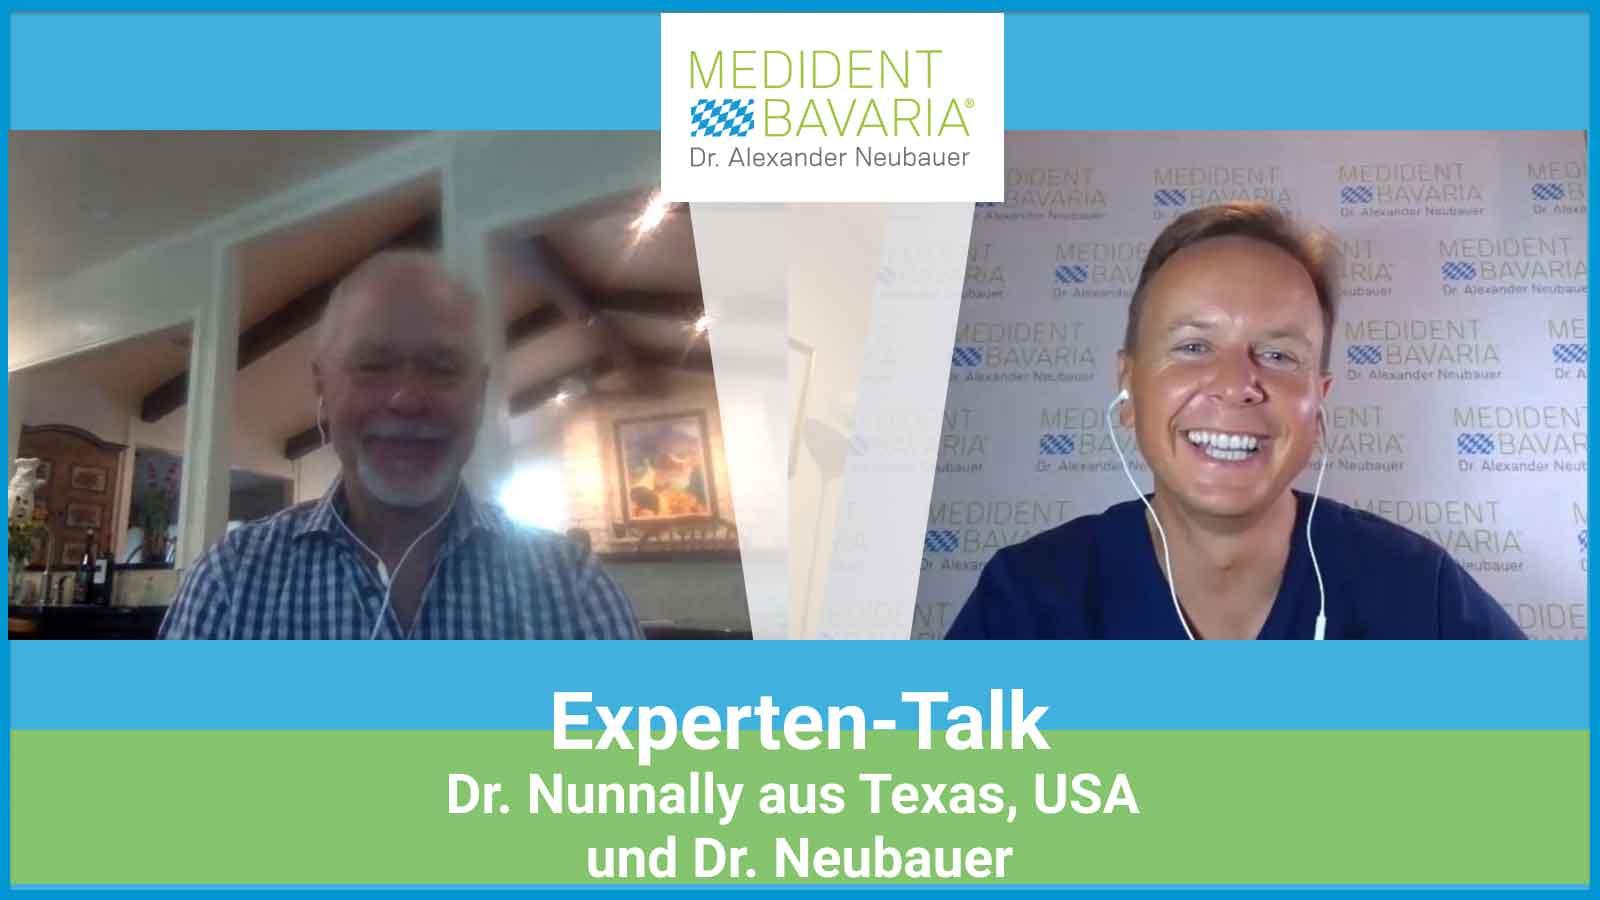 Experten-Talk Dr. Nunnally, Texas, USA und Dr. Neubauer